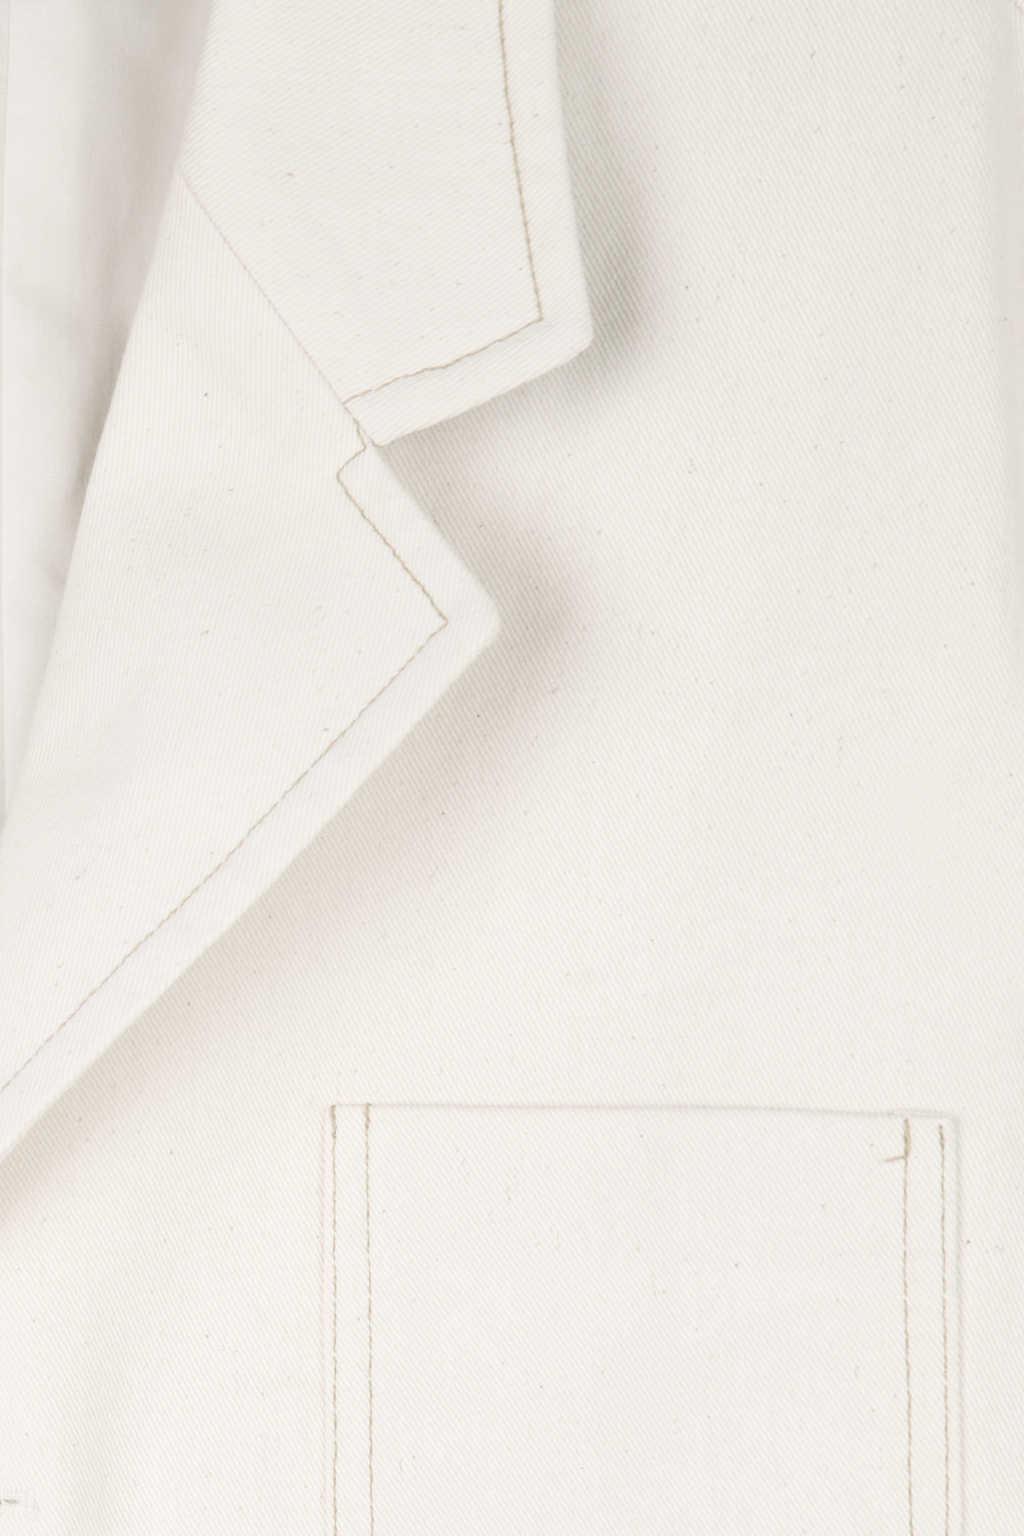 Jacket K002 Cream 6